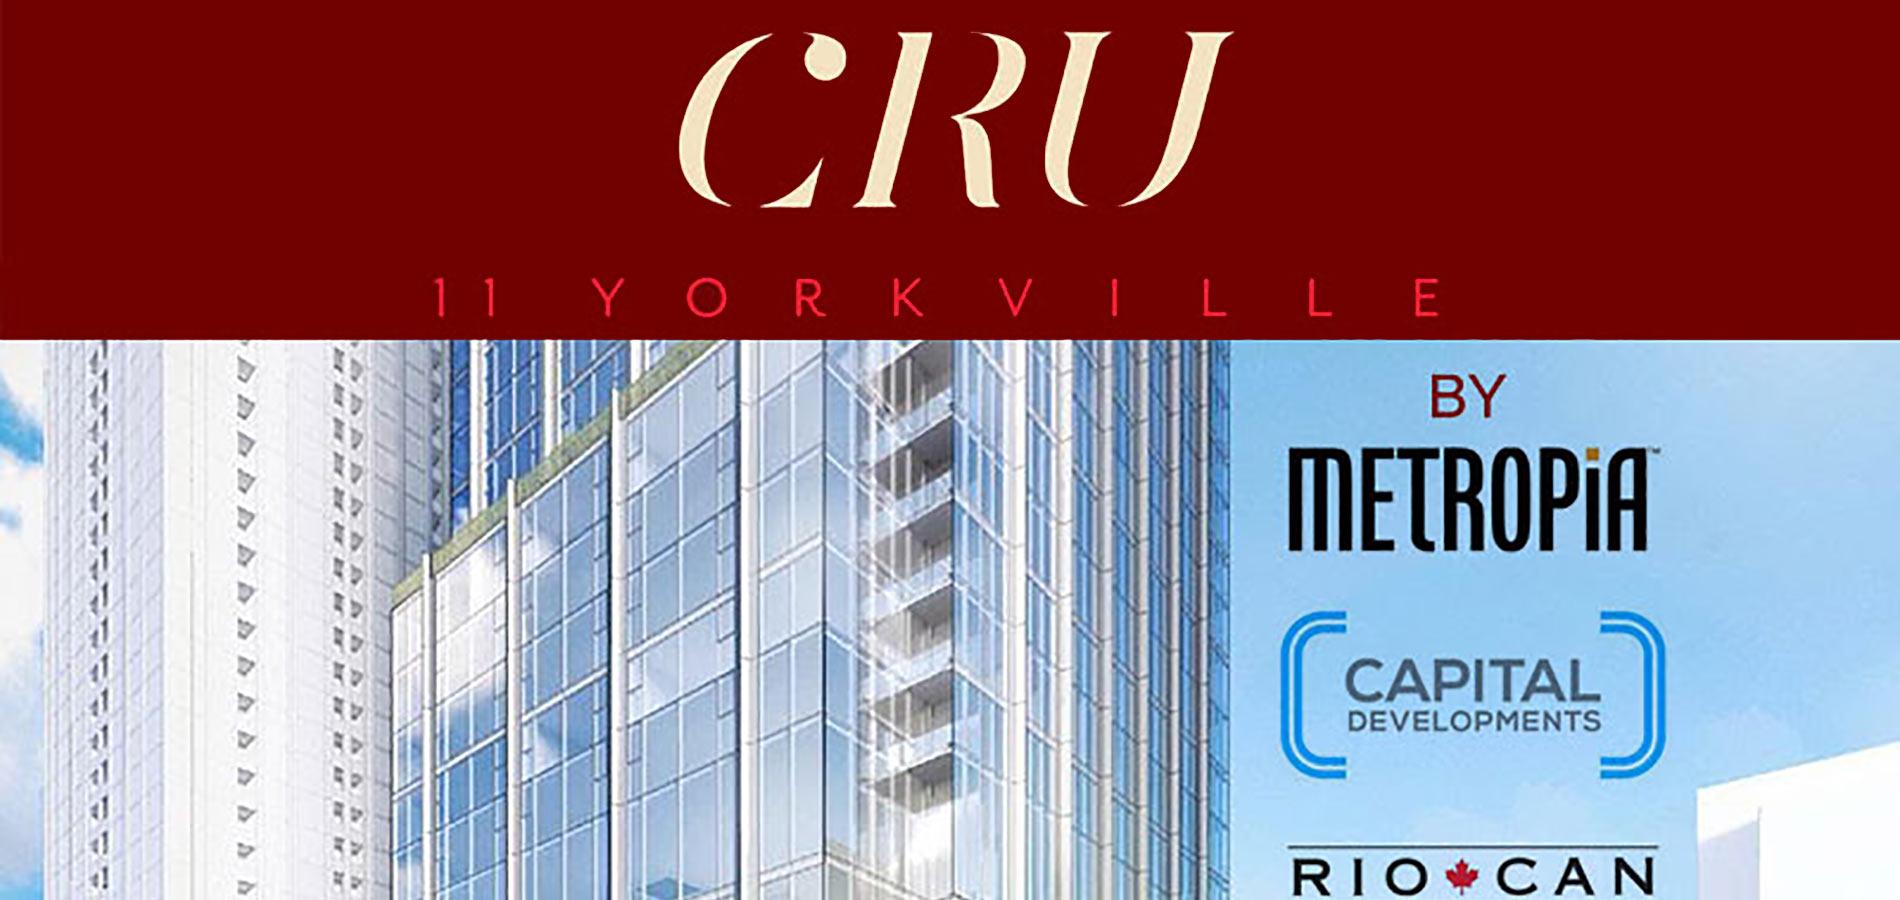 CRU 11 YORKVILLE Condos